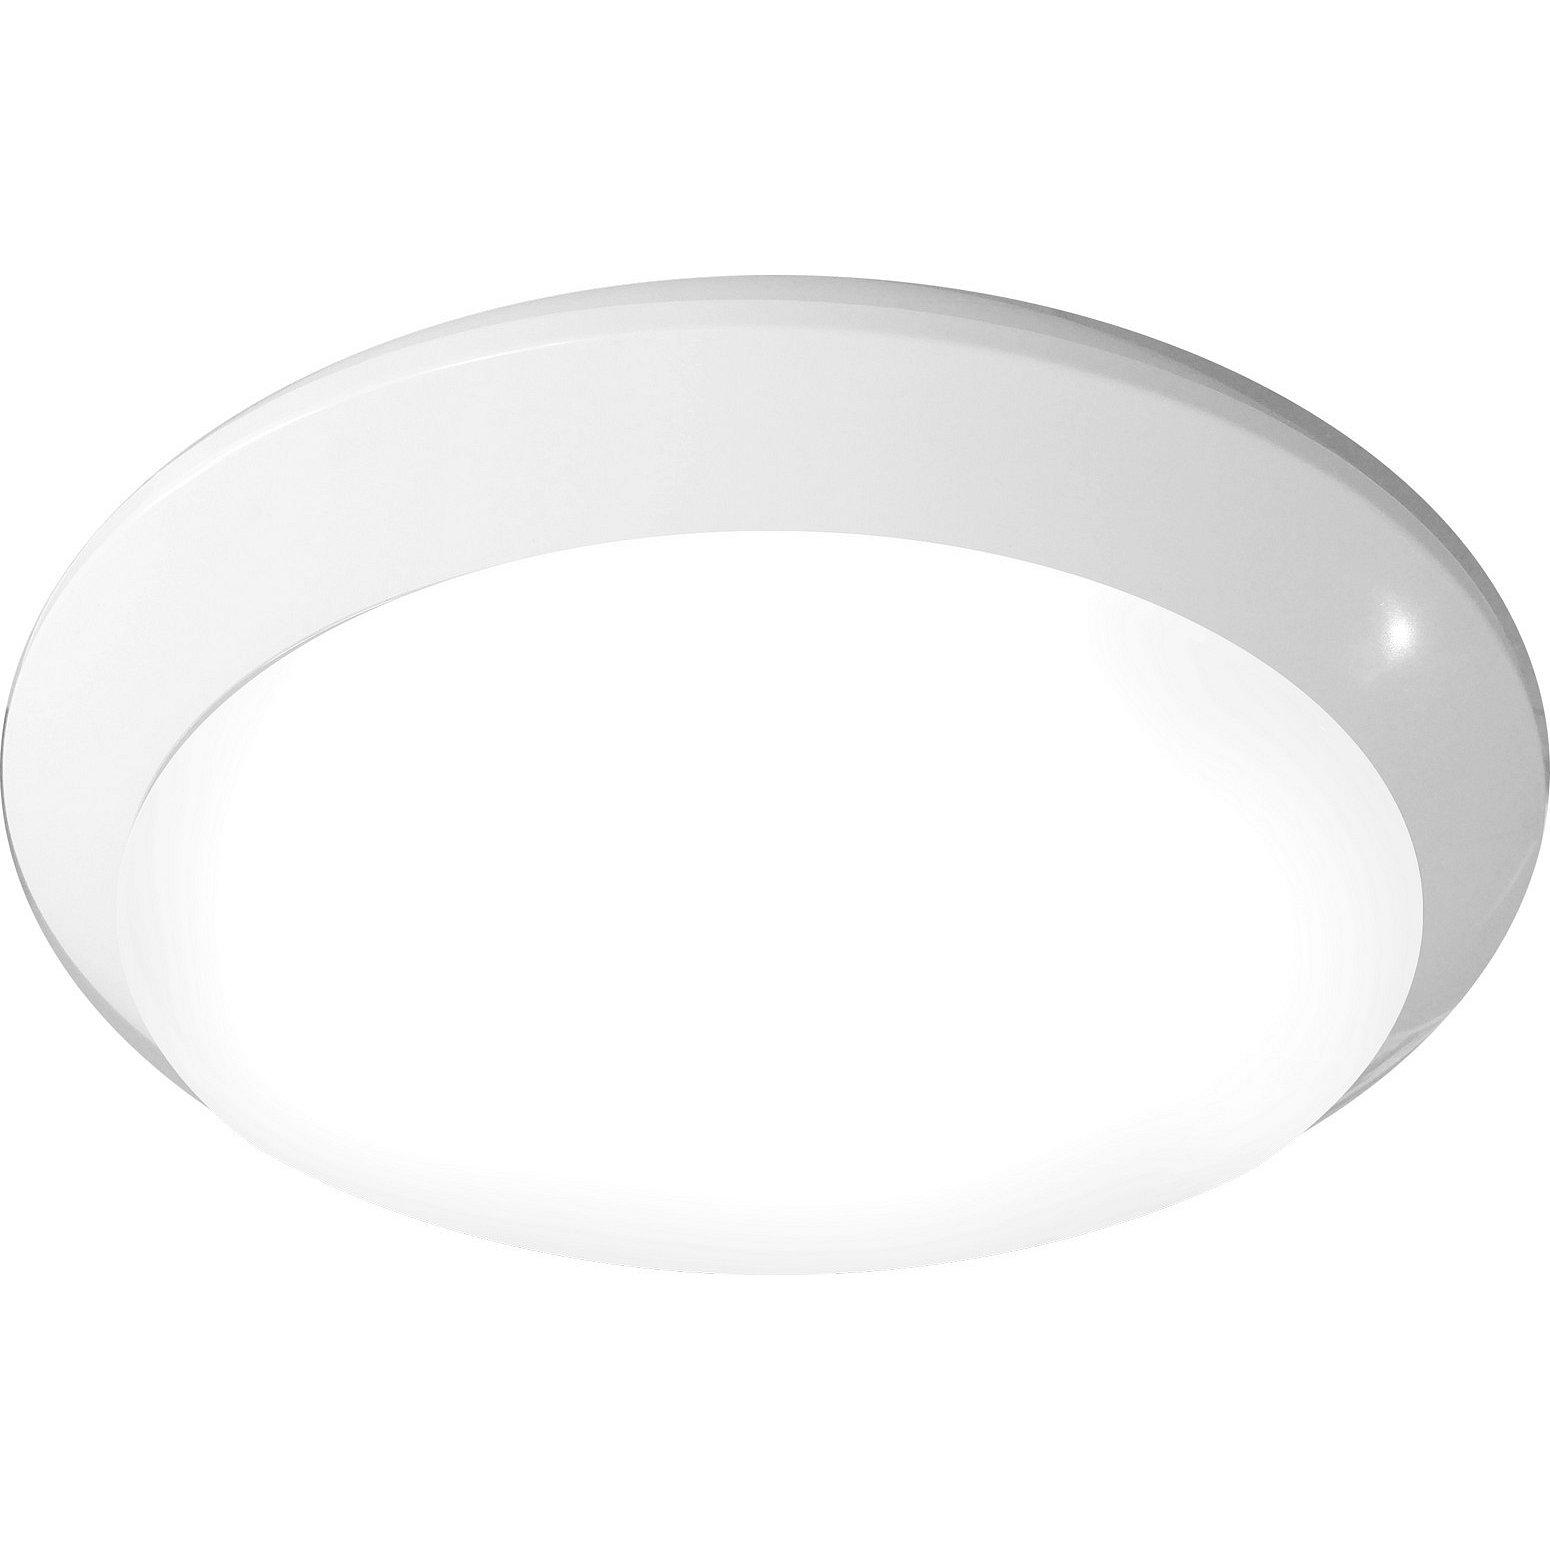 Svítidlo LED Greenlux Reno PROFI, 4000K, 20W, IP66 bílá